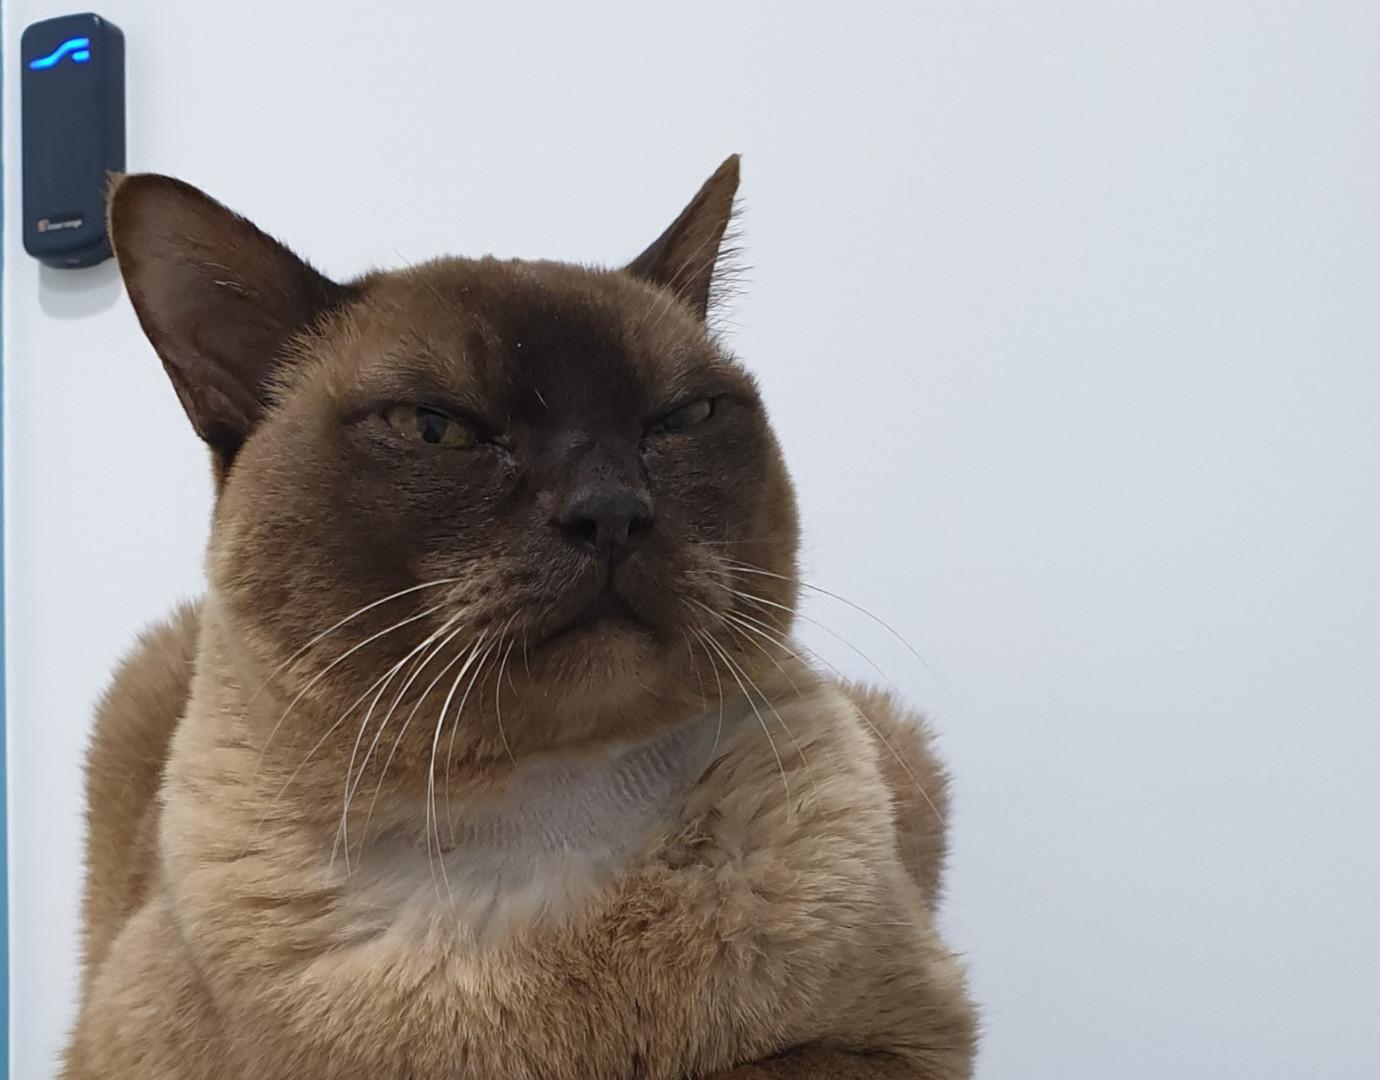 Relaxed Cat Vogue Vets & Wellness Centre